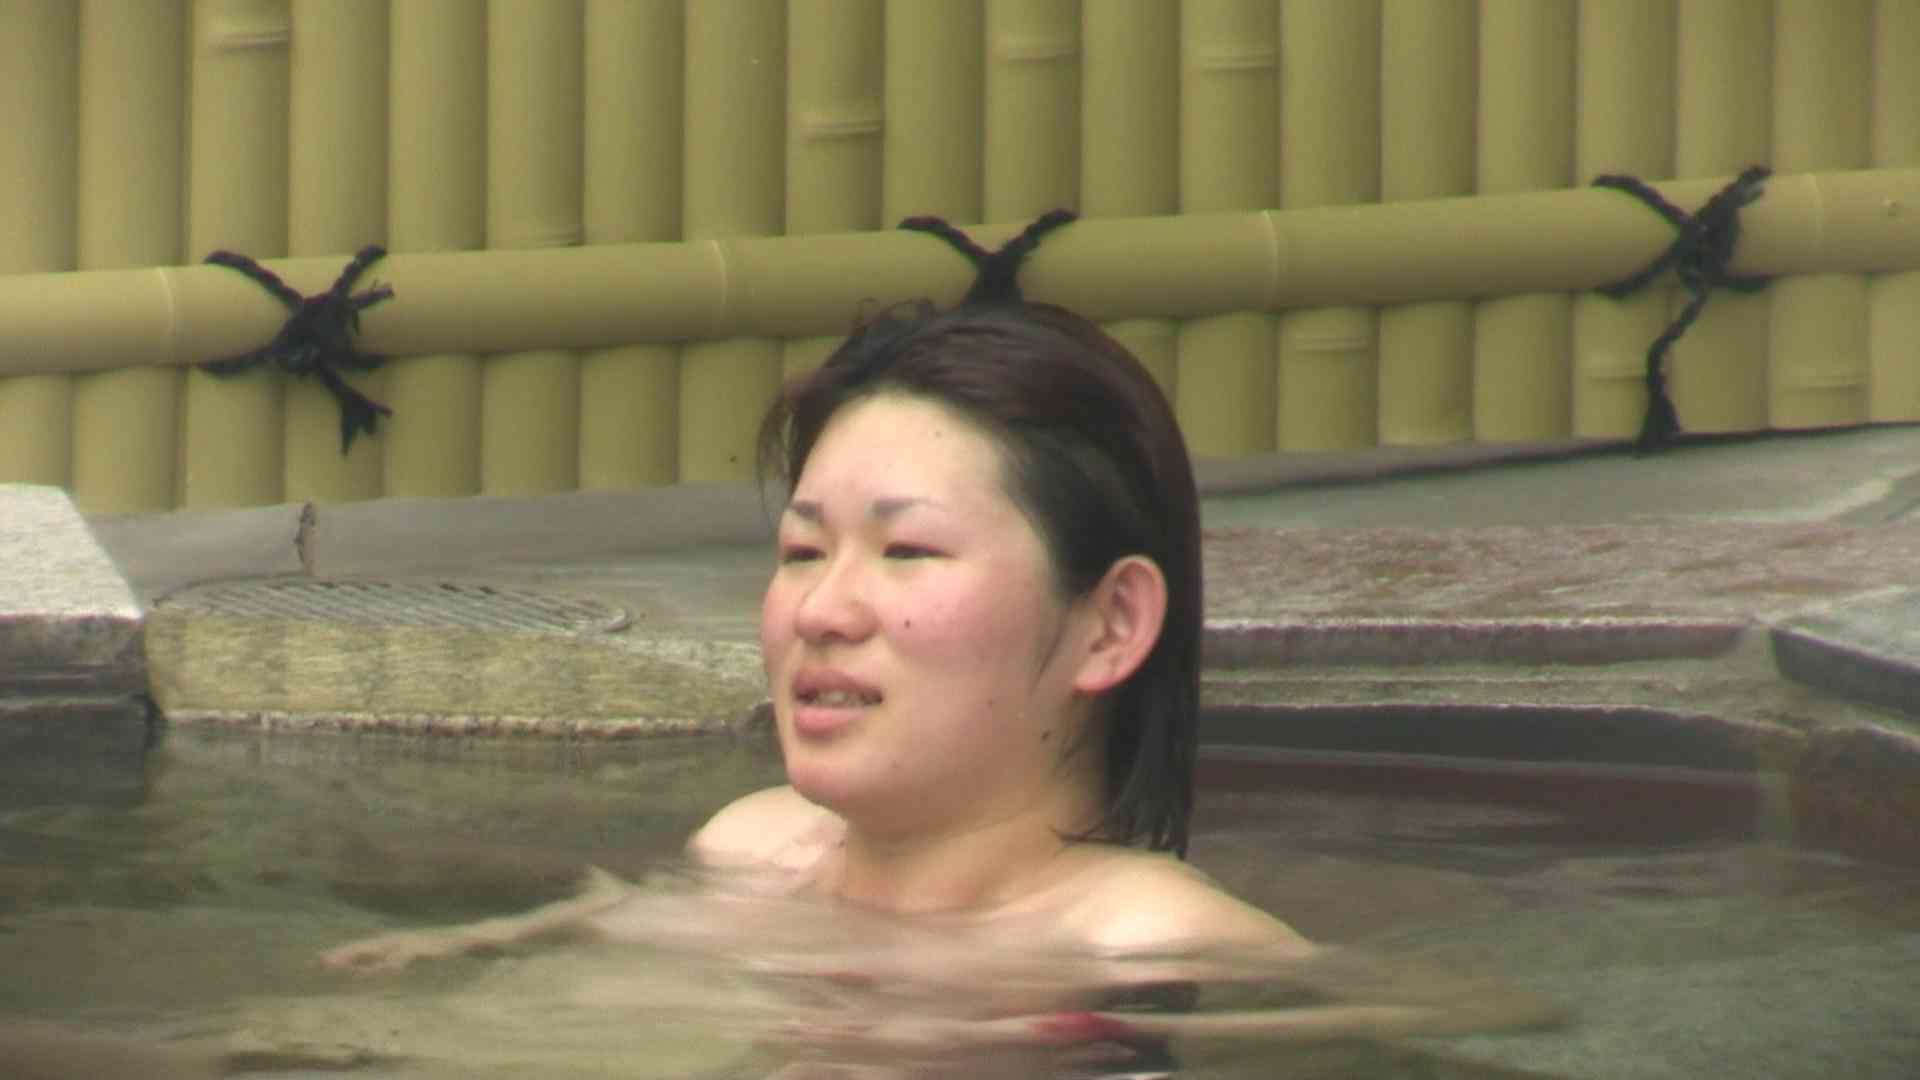 Aquaな露天風呂Vol.673 盗撮 おめこ無修正画像 45連発 26